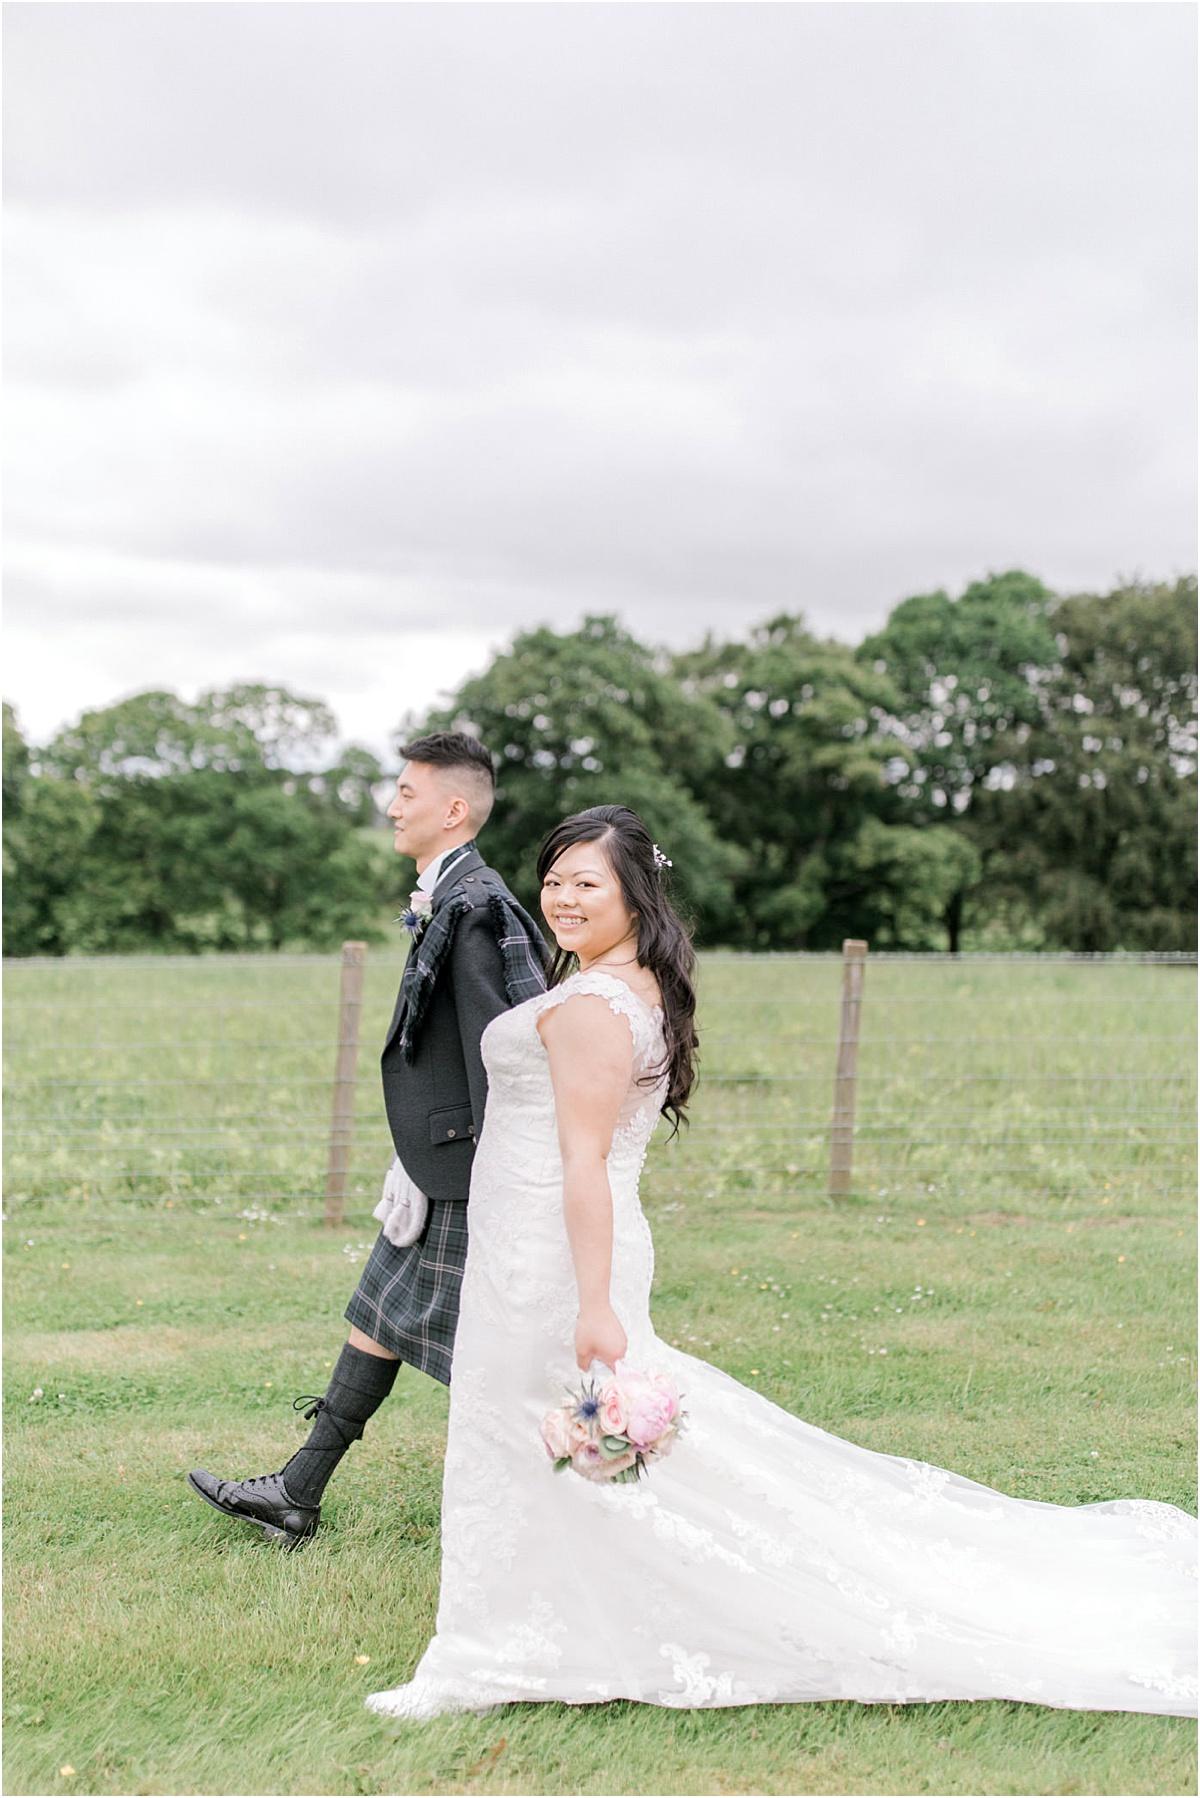 Fine Art Wedding Photographers,The Gibsons,elegant wedding photographers glasgow,light and airy wedding photographers glasgow,natural wedding photographers,romantic photographers Scotland,two wedding photographers scotland,